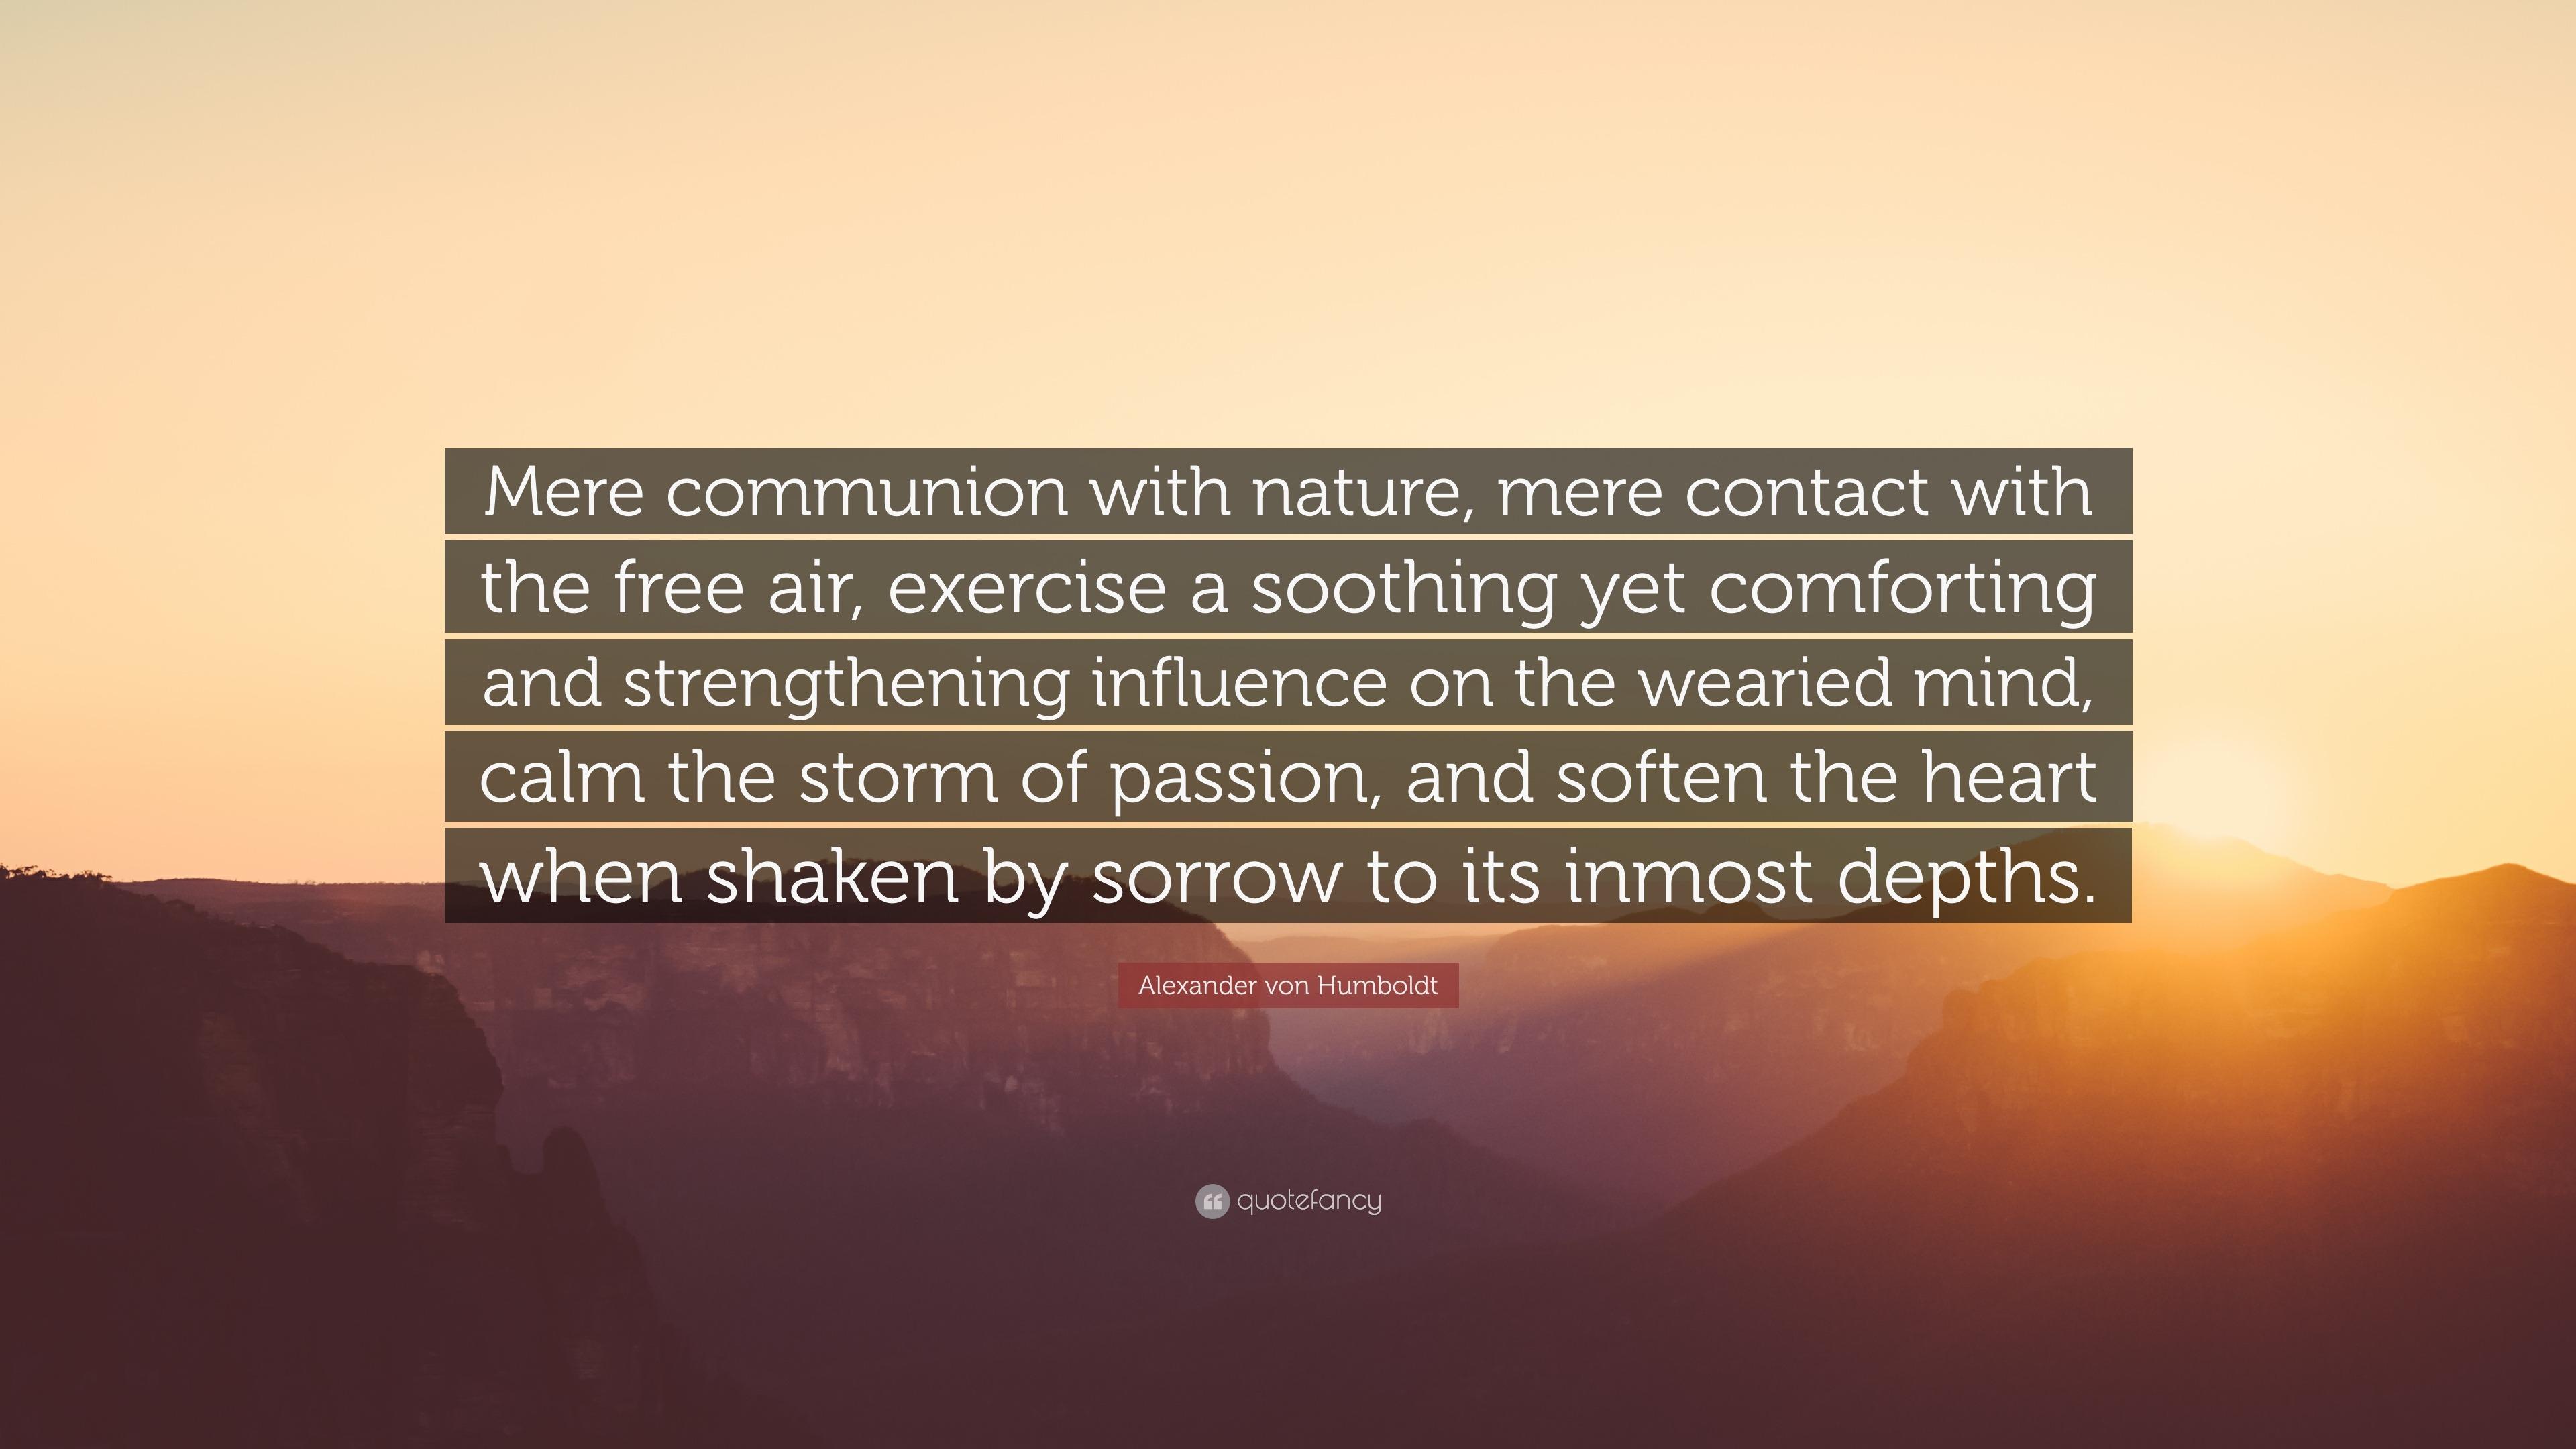 Alexander Von Humboldt Quote Mere Communion With Nature Mere